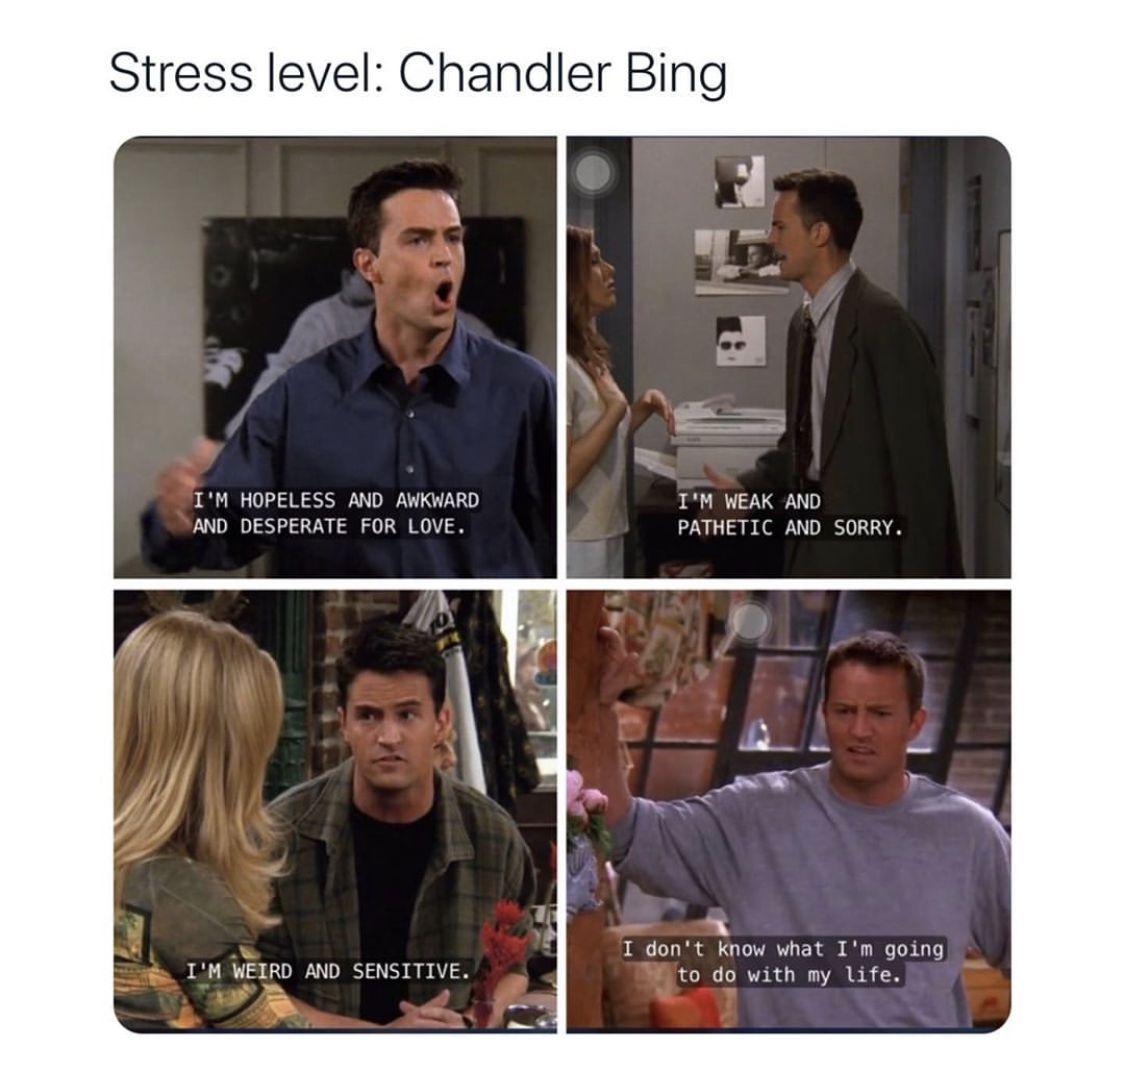 Funny Memes Funnymemes Friends Friendstvshow Friendsmemes Chandler Bing Chandler Bing One Job Daily Odd Com Friends Funny Moments Friend Jokes Friends Tv